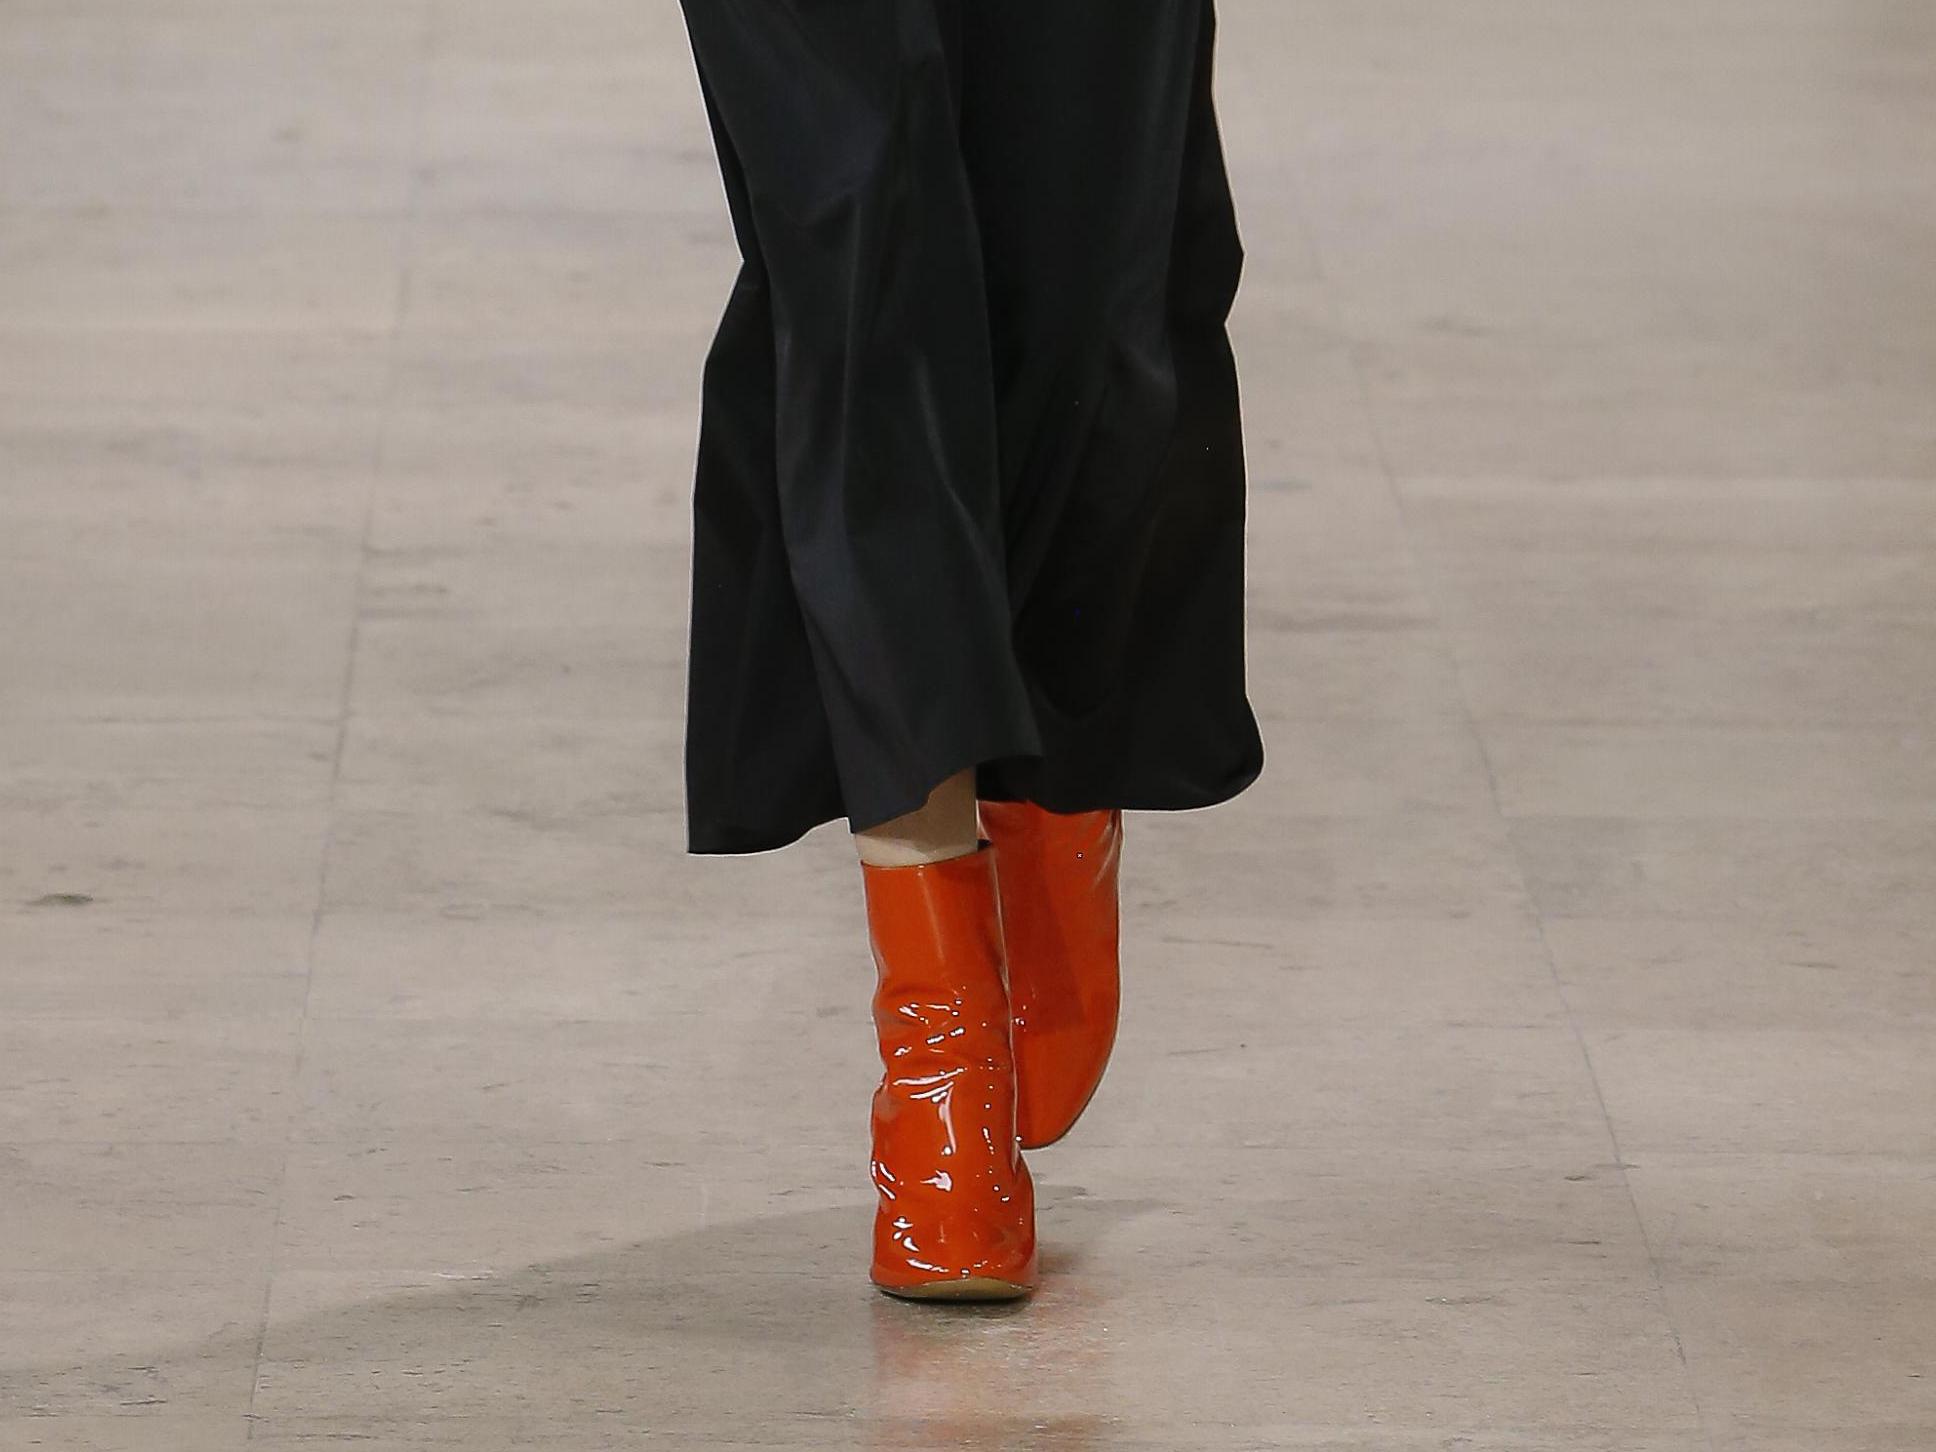 d76df8530 Bellwether Boots | Affidavit